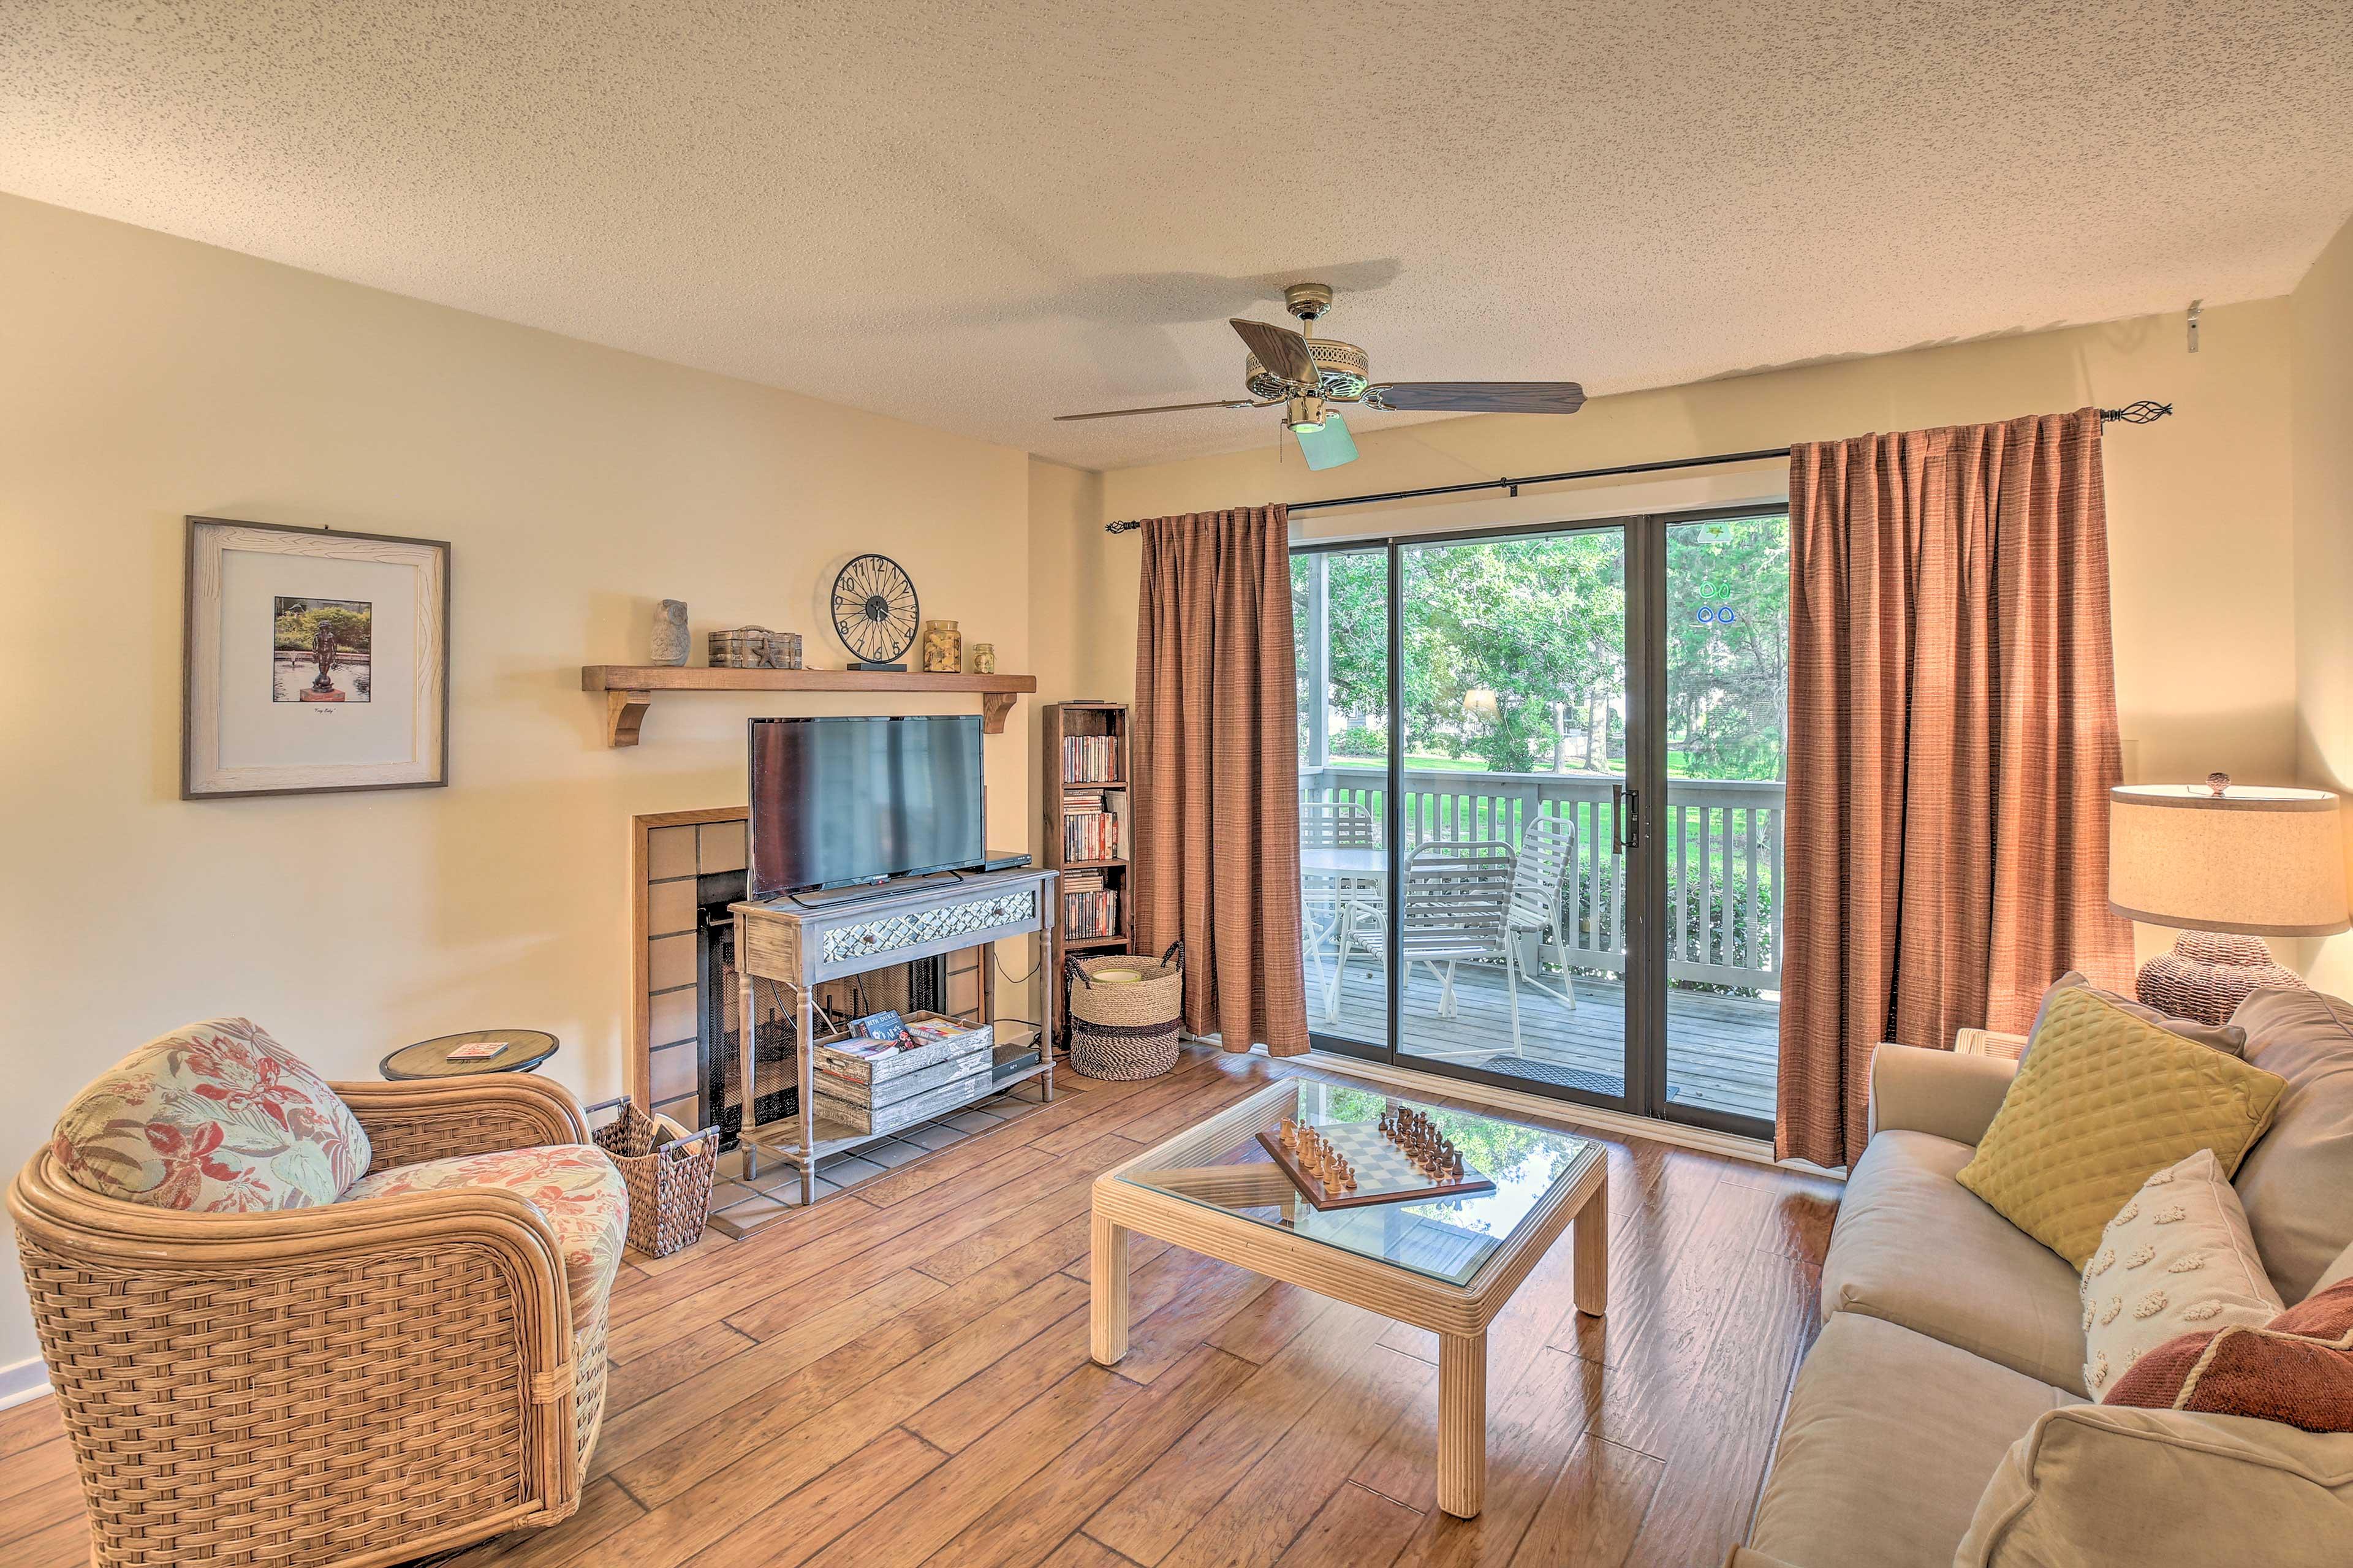 Living Room | Free WiFI | Flat-screen TV w/ DVD Player